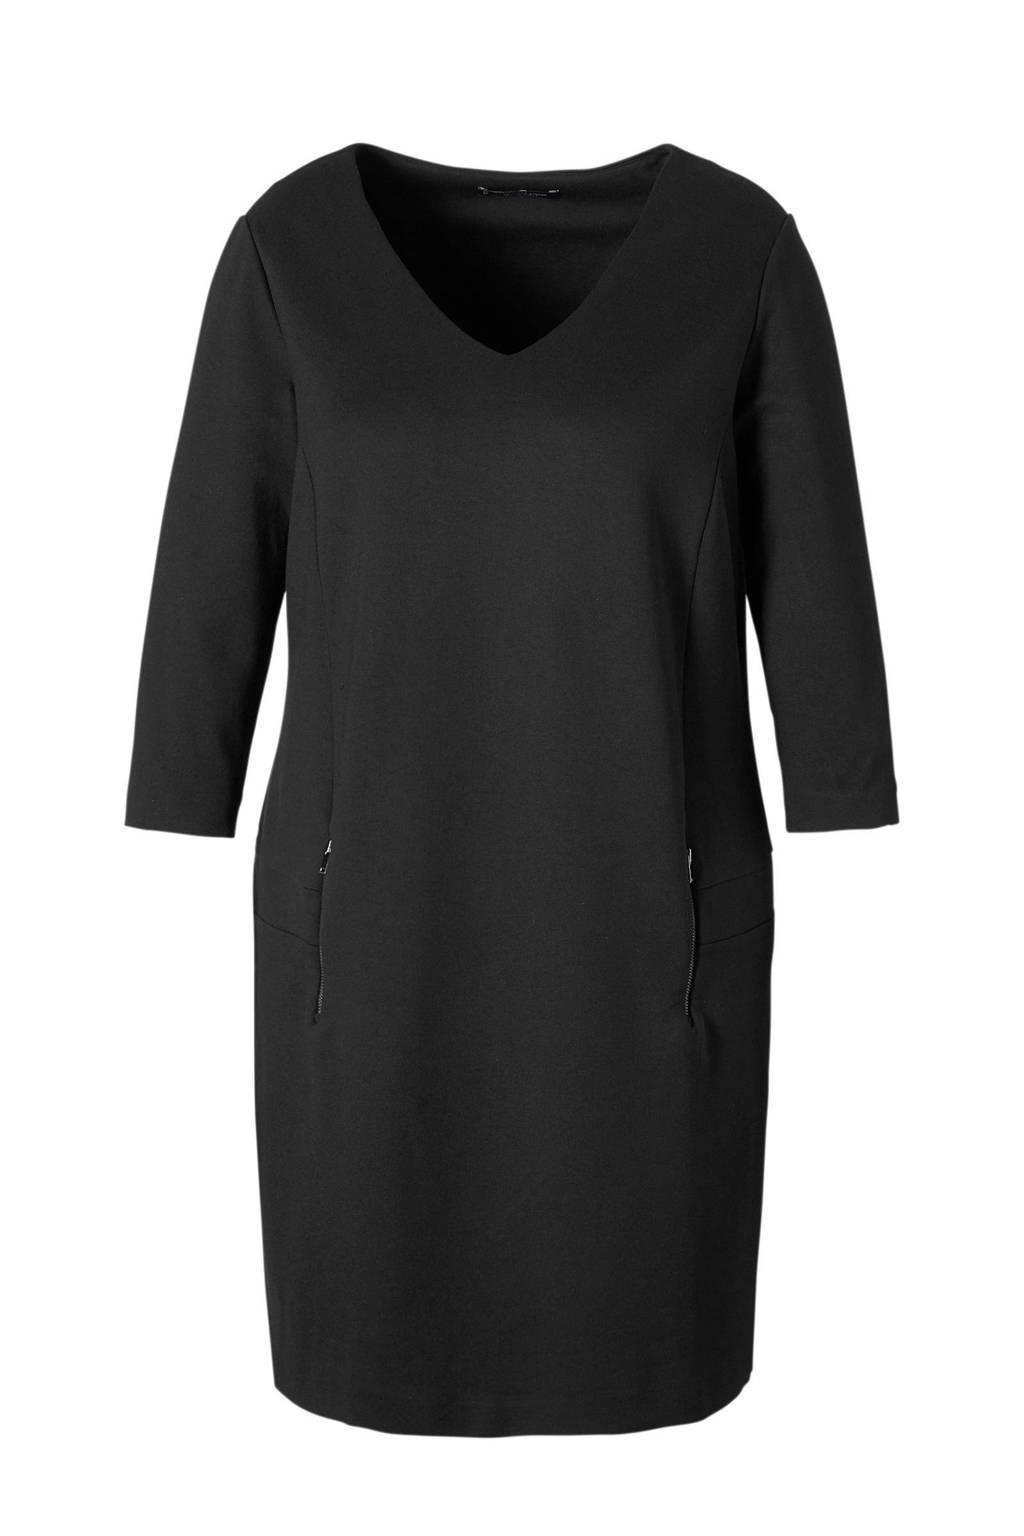 Violeta by Mango jurk, Zwart